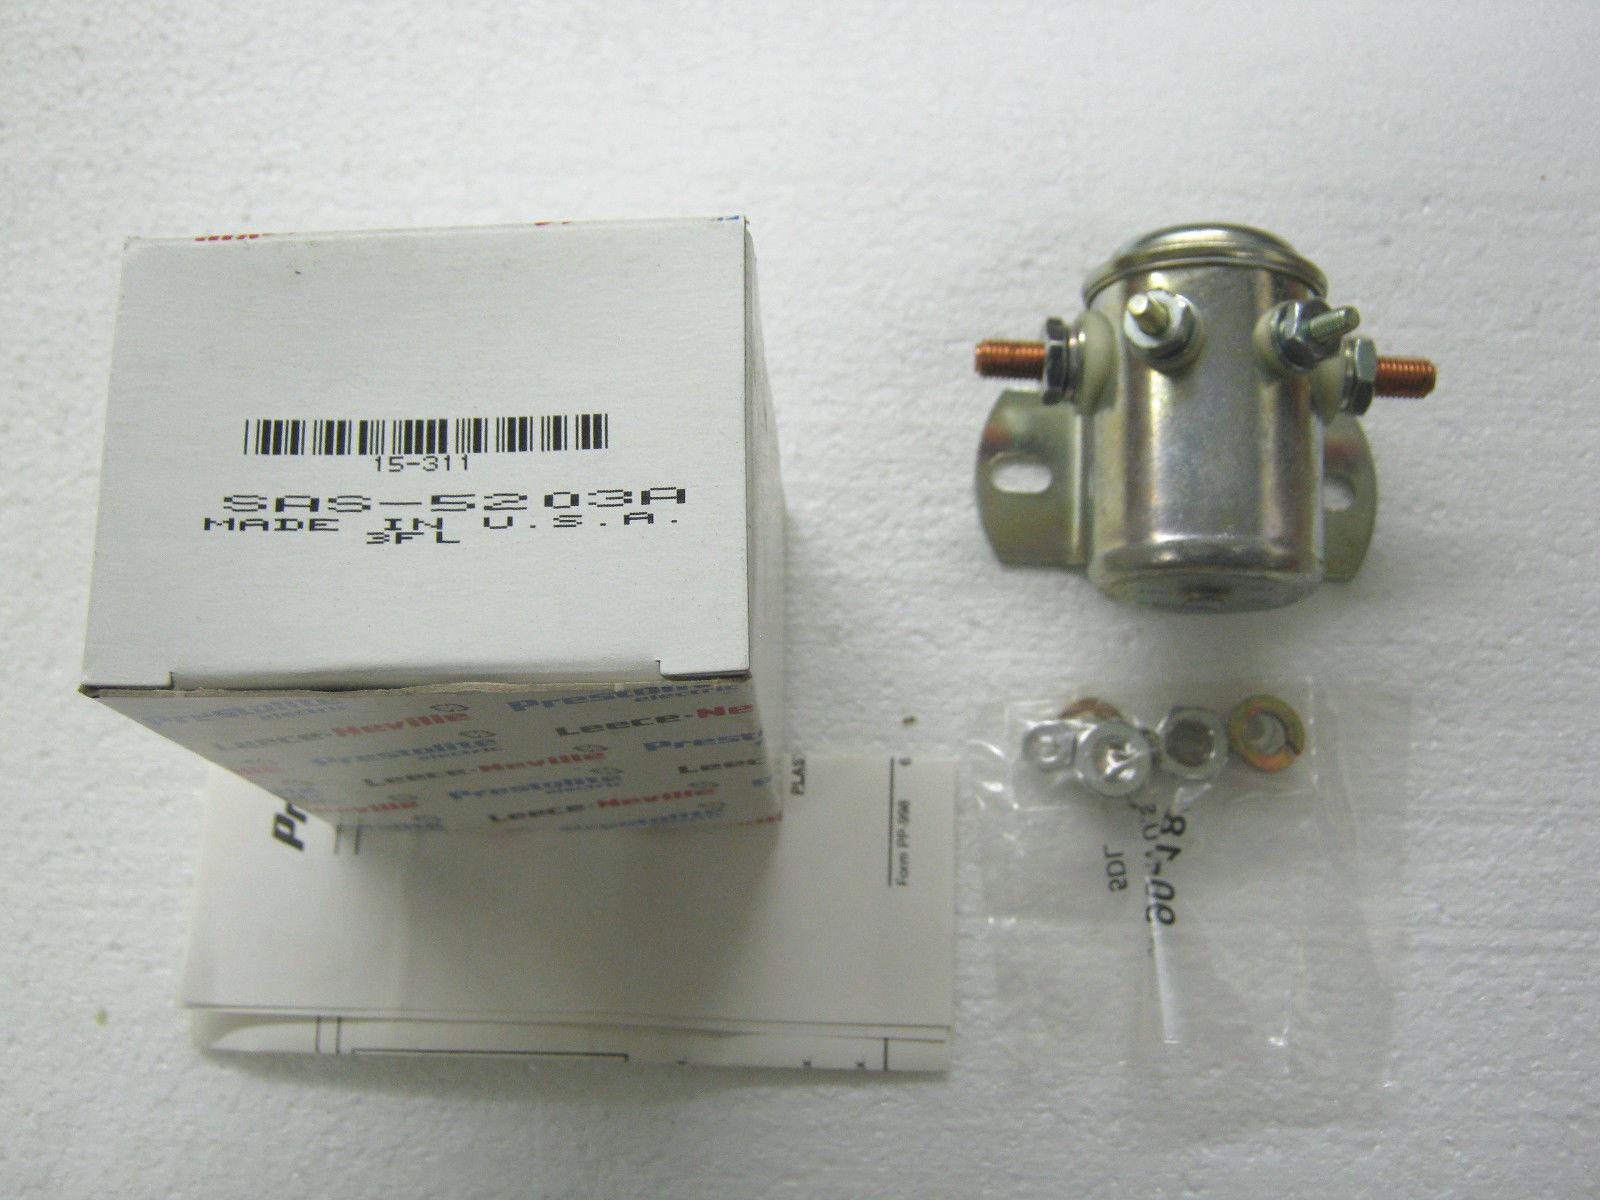 Image 1 - Prestolite 12V Solenoid, 15-311 (SAS-5203A), Continuous, Single Pole, NOS